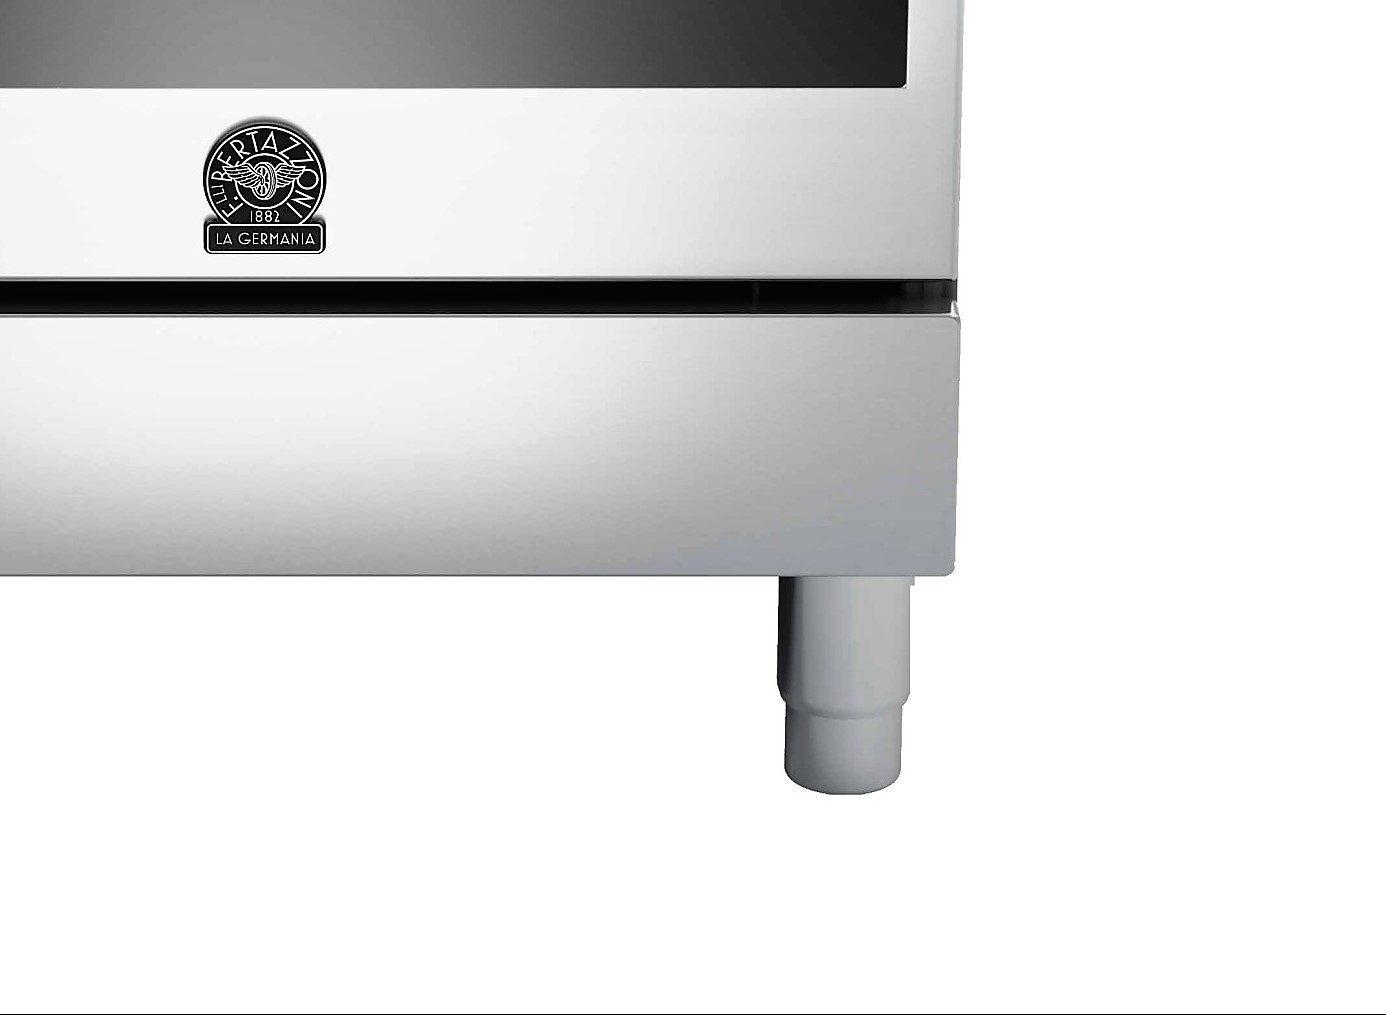 Fogão de Piso BERTAZZONI LA GERMANIA Série Futura 4  Queimadores Forno Elétrico Multifunções 60cm